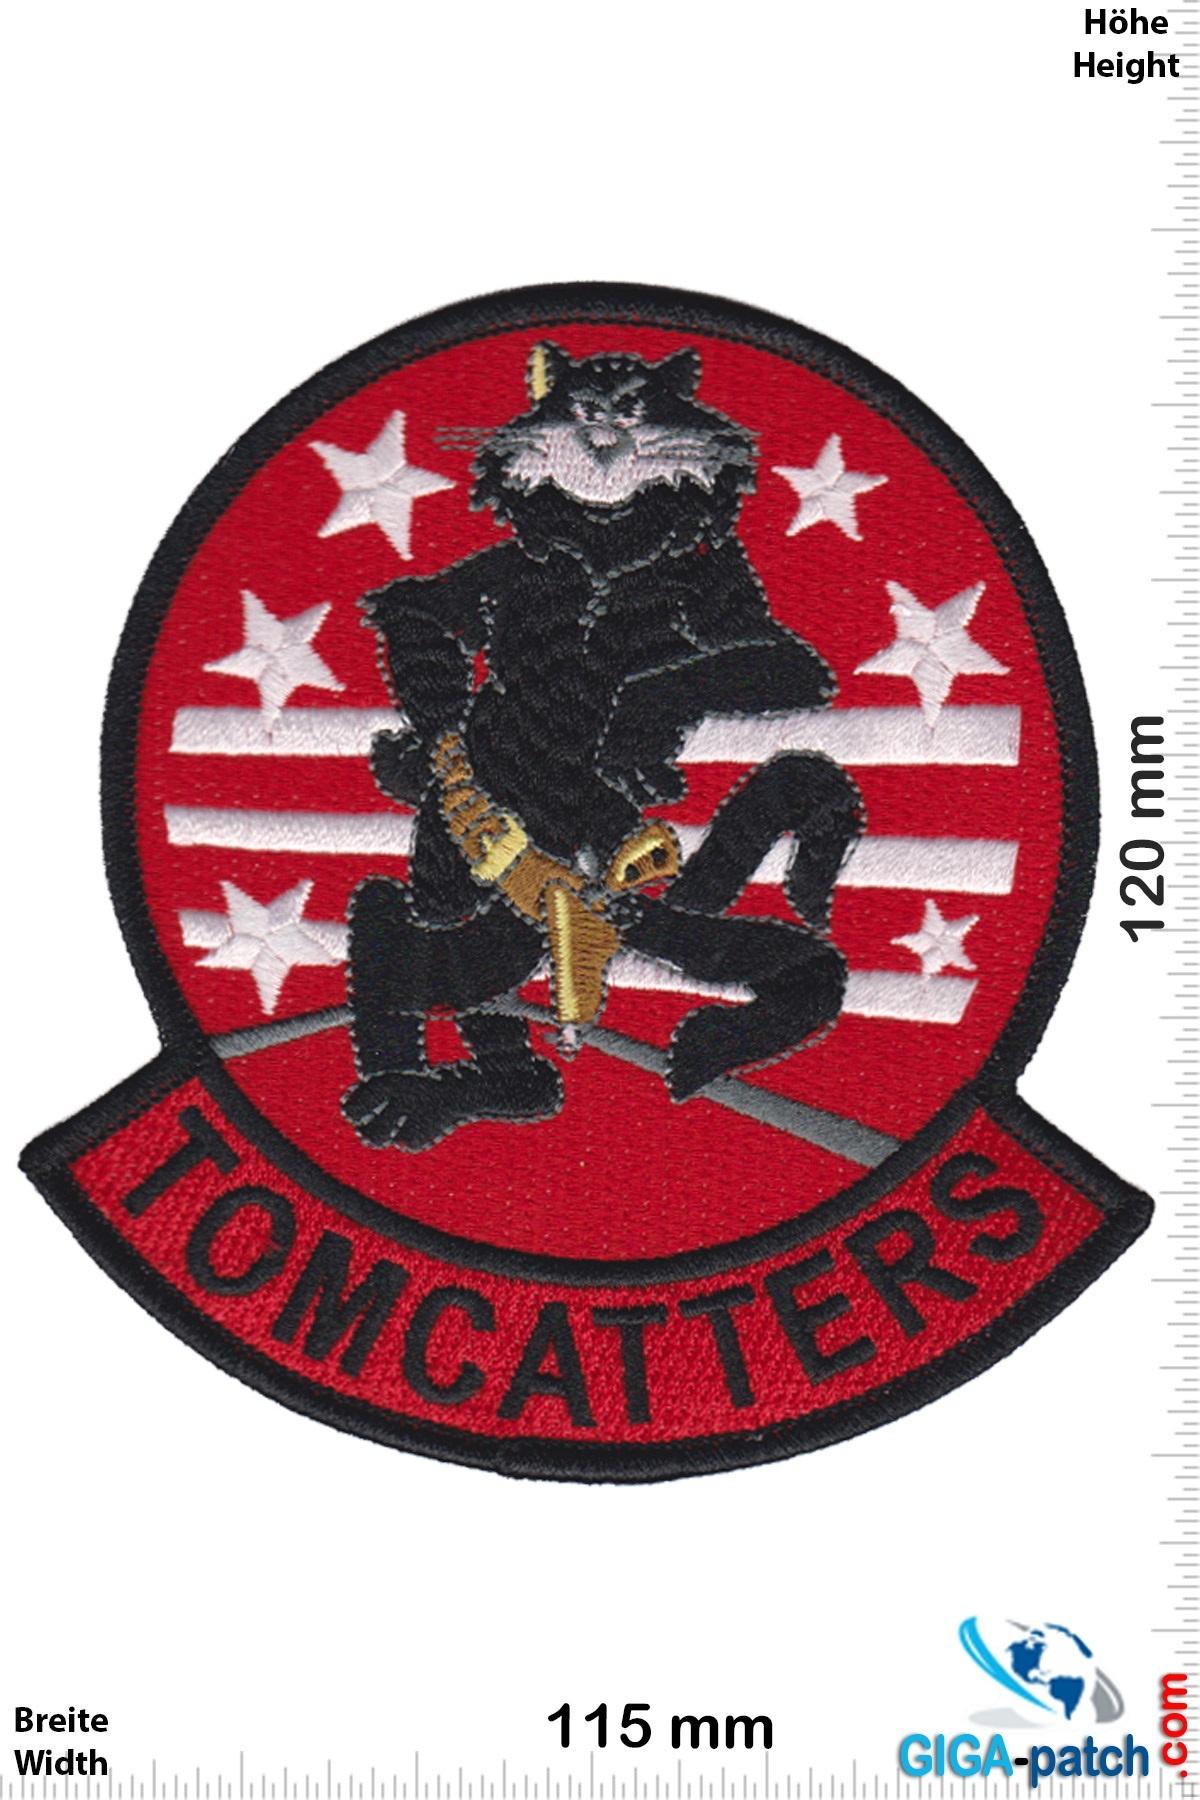 U.S. Navy Navy Fighting Squadrons-  TOMCATTERS -  VF, VC, & VFP- HQ